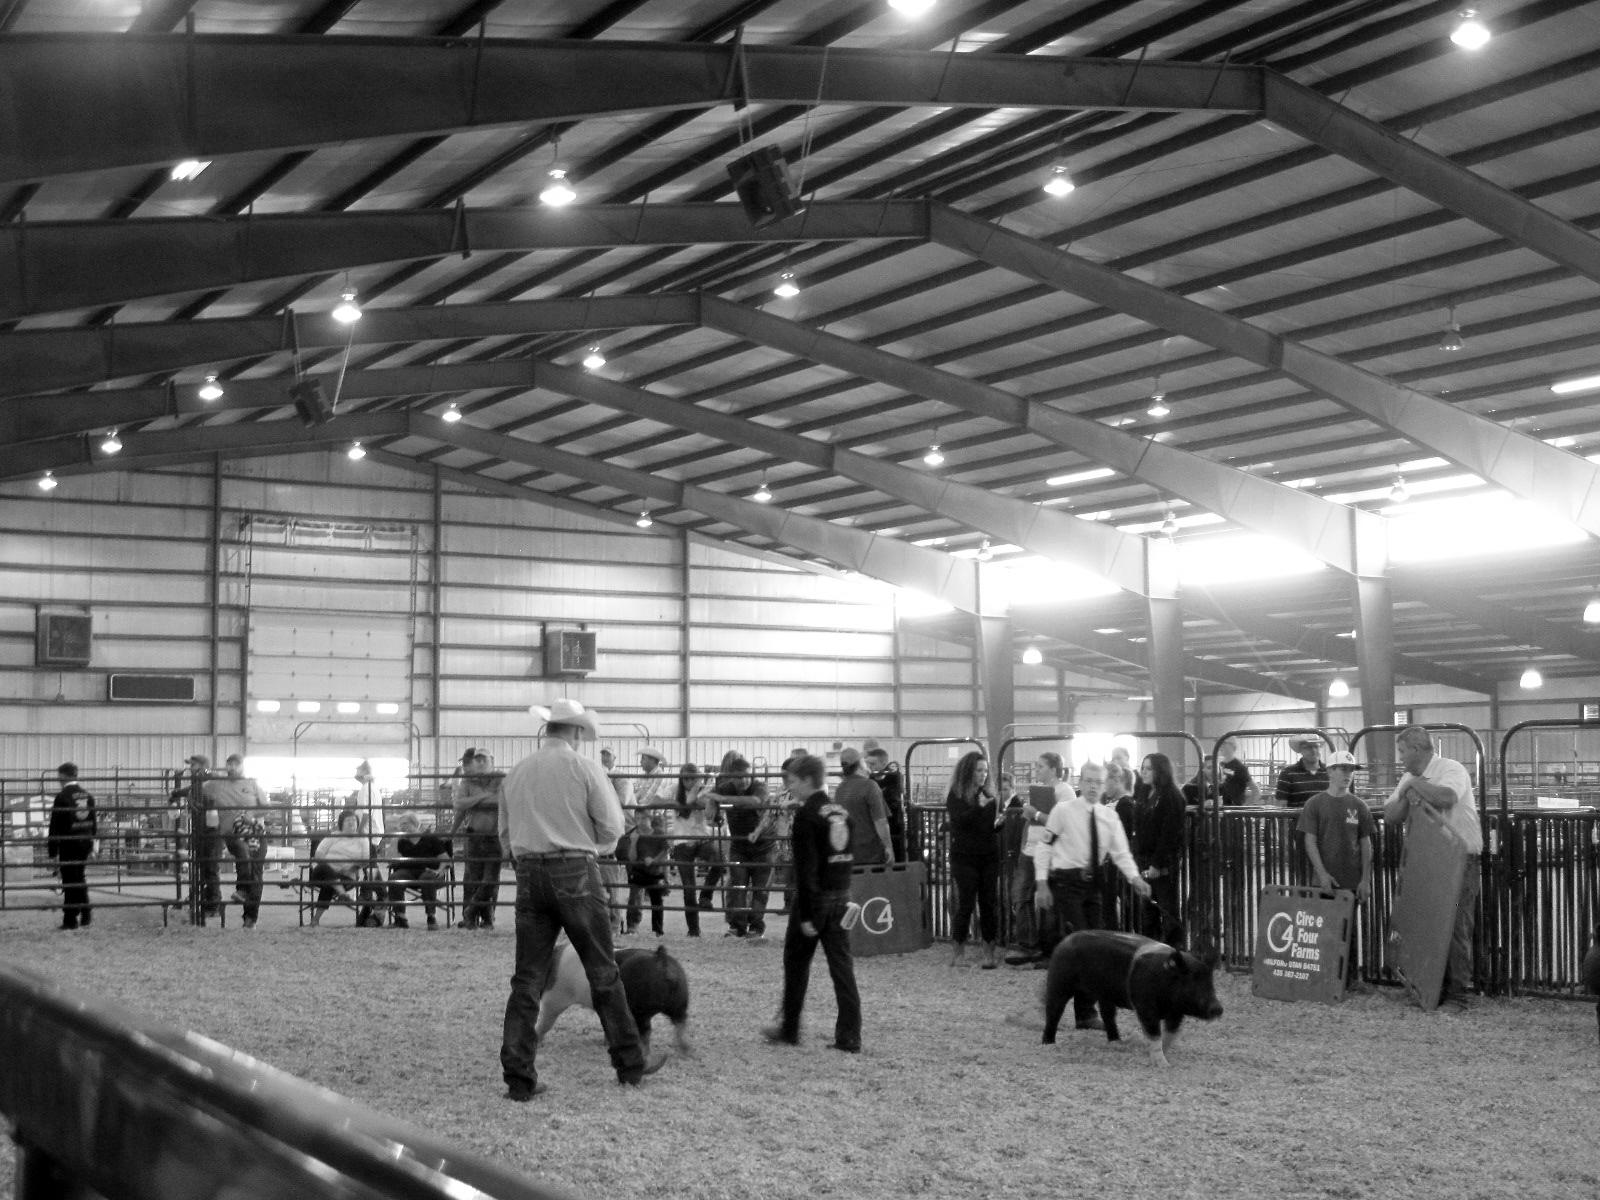 Lincoln County 4-H/FFA compete in several events